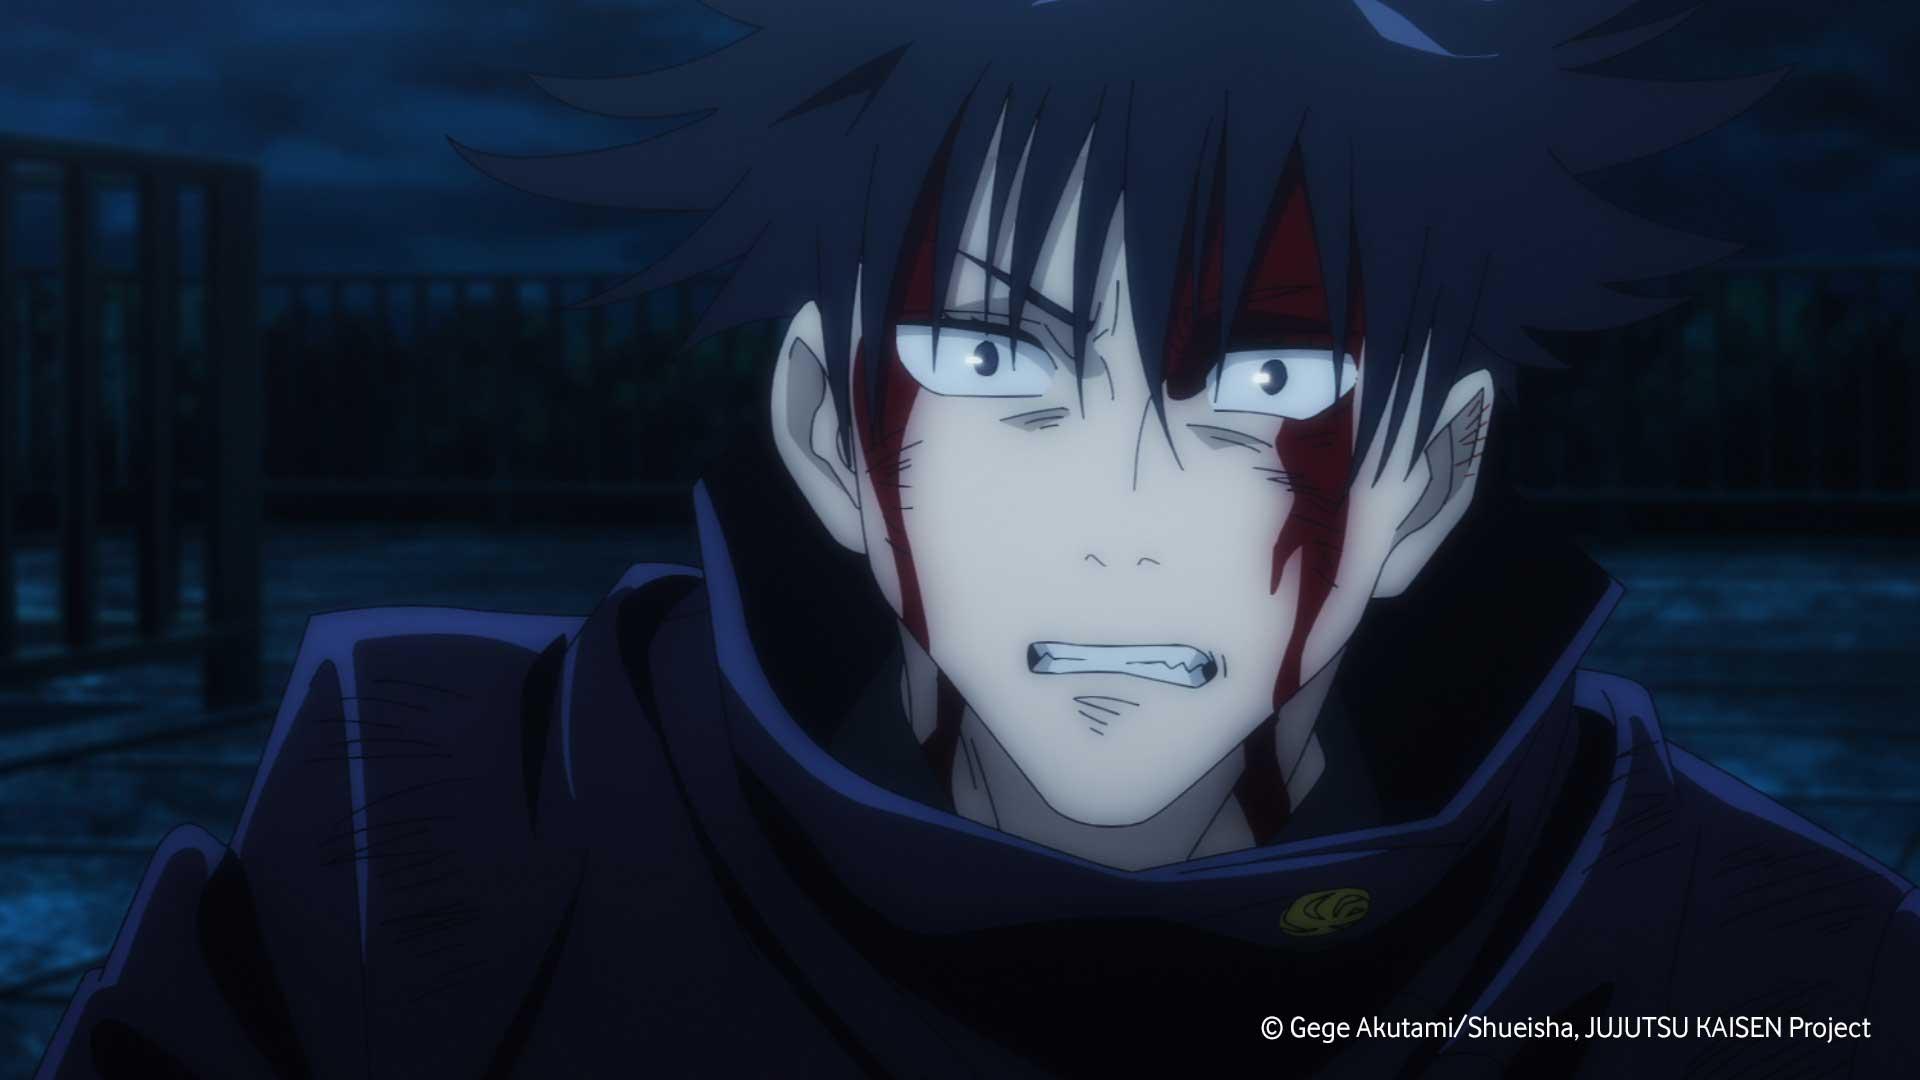 Megumi blutet in Jujutsu Kaisen